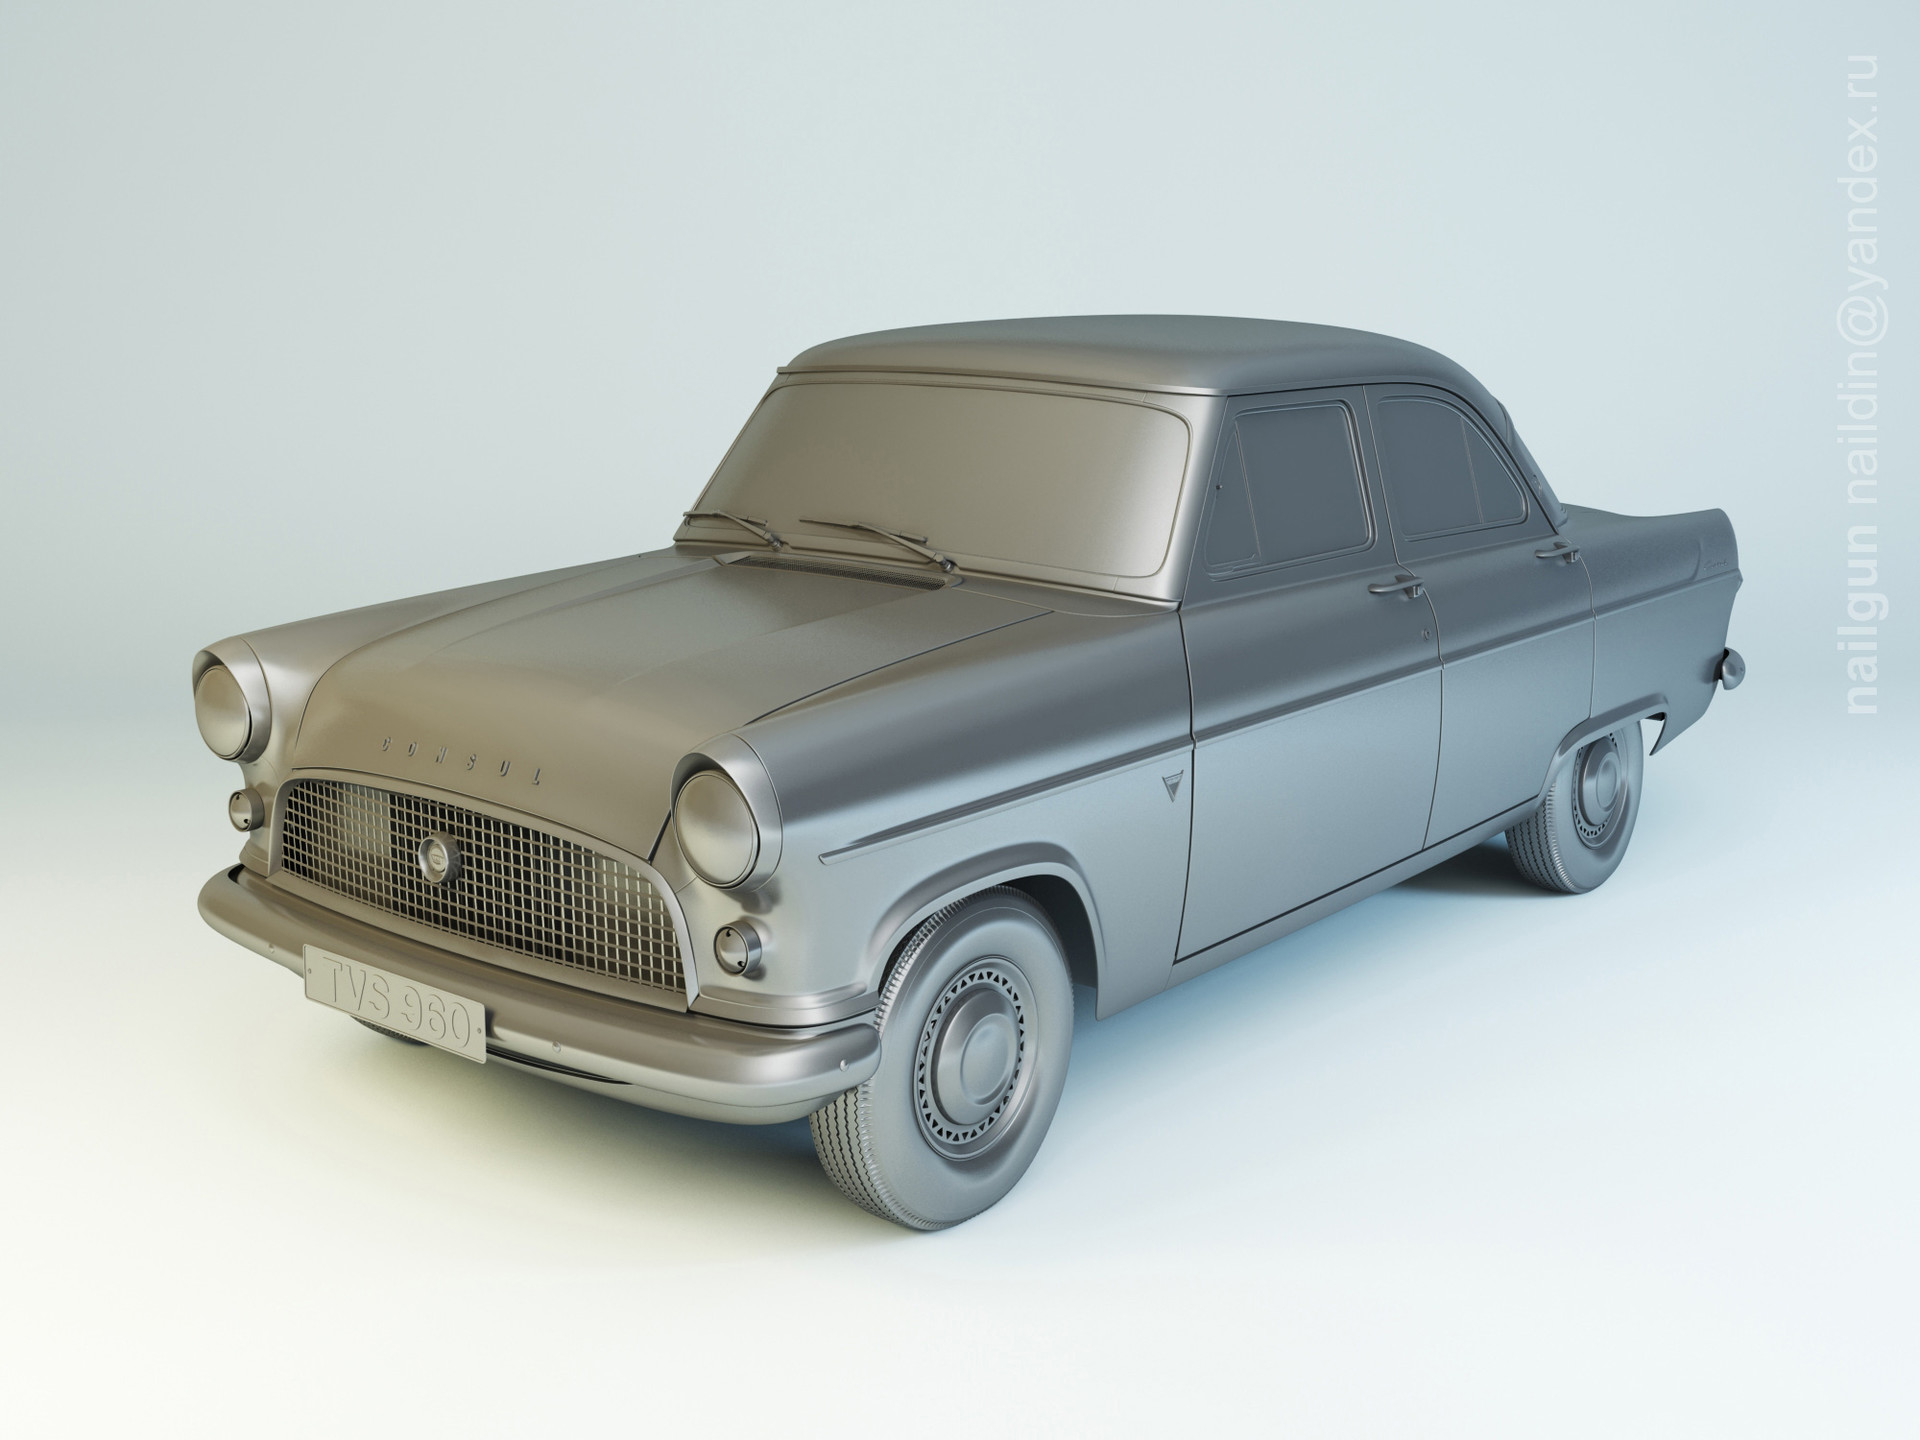 Nail khusnutdinov pwc 019 002 ford consul modelling 0